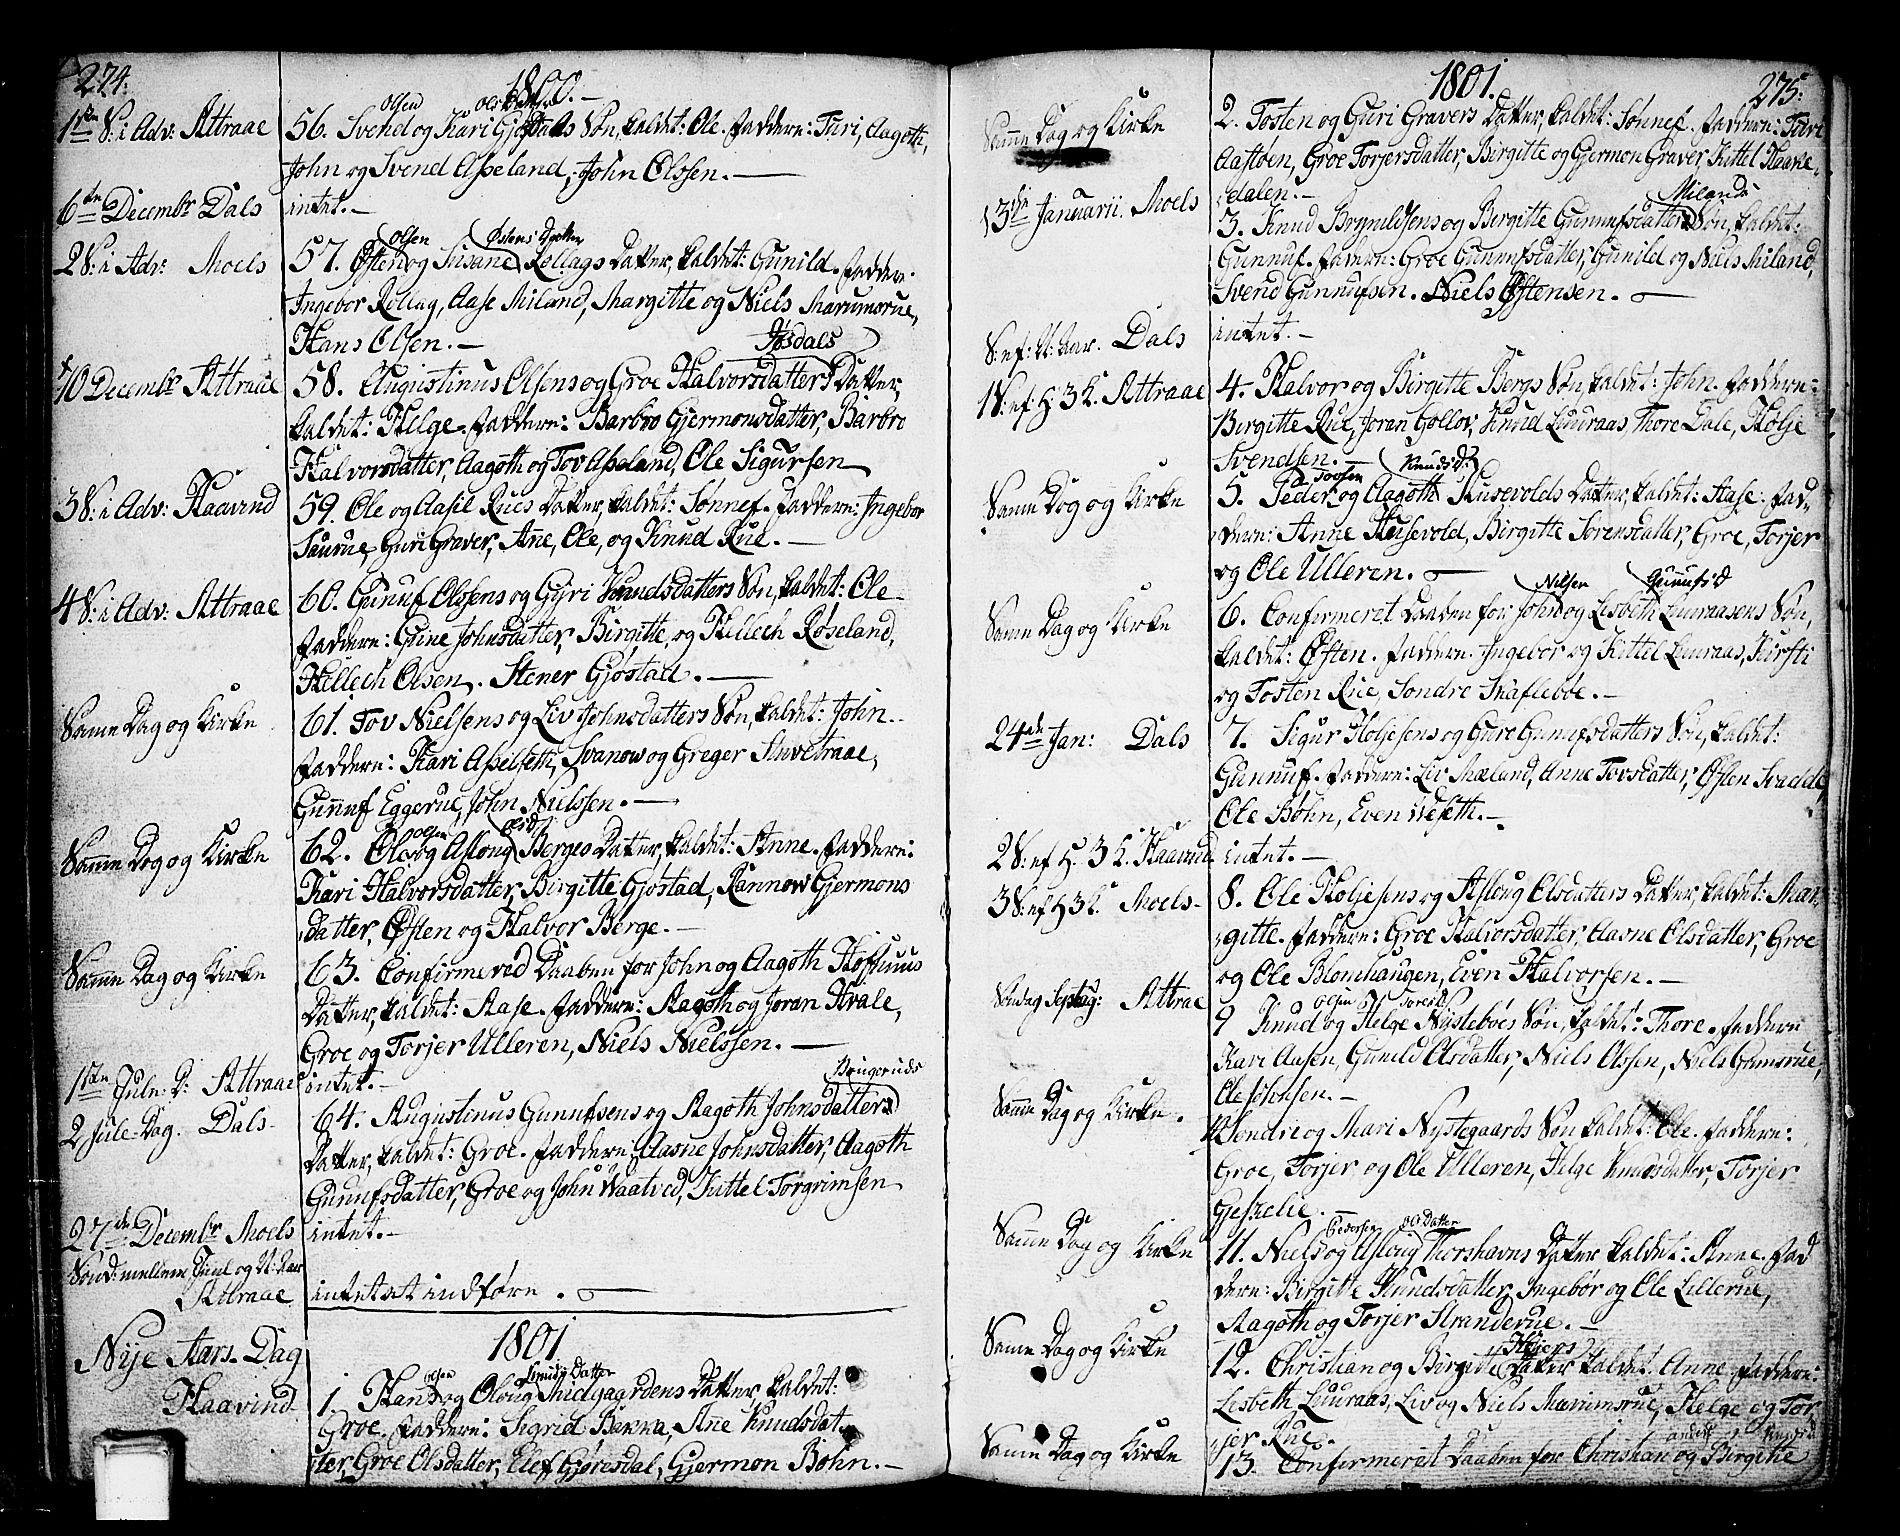 SAKO, Tinn kirkebøker, F/Fa/L0002: Ministerialbok nr. I 2, 1757-1810, s. 274-275